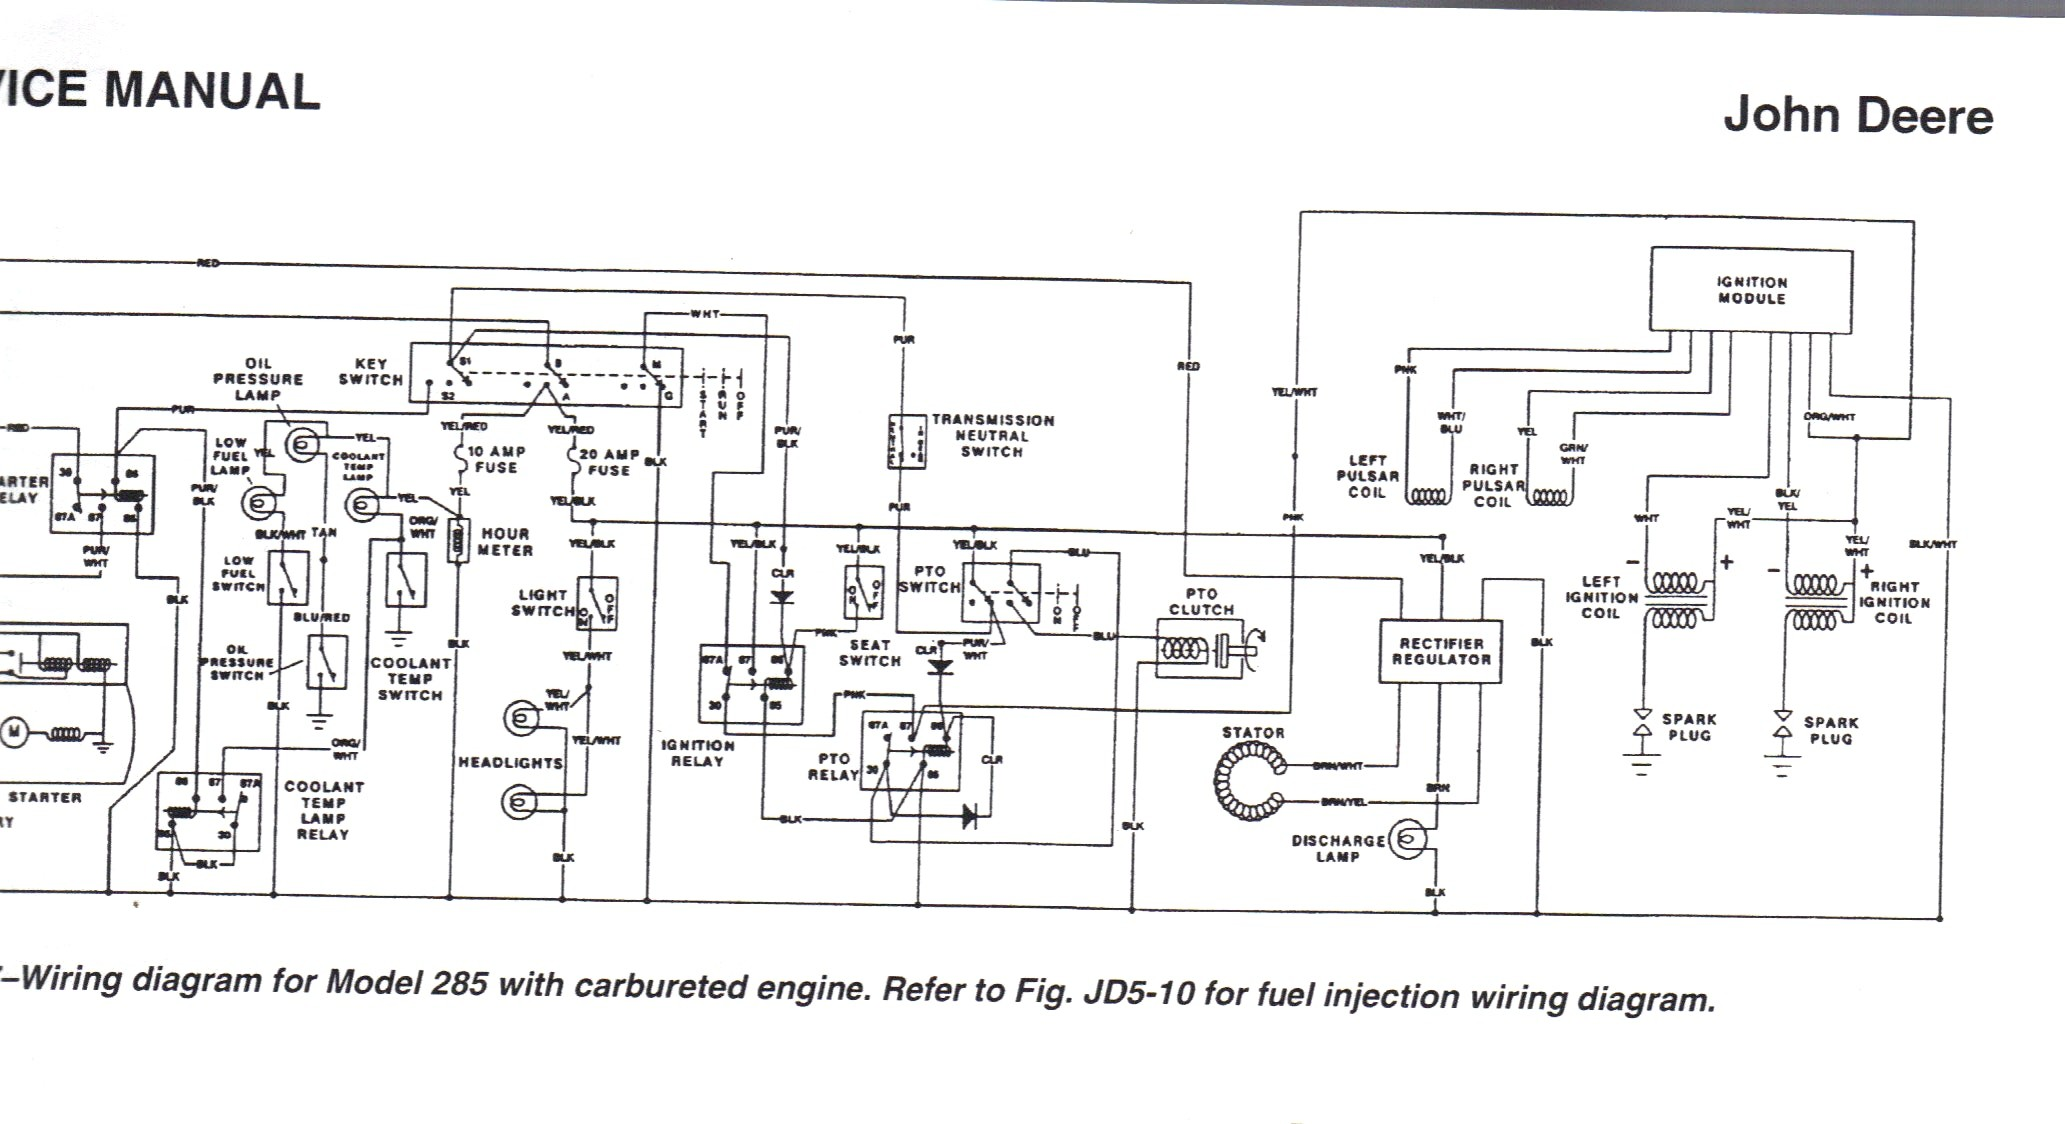 [DIAGRAM_38ZD]  FD35A7 John Deere Z225 Wiring Diagram | Wiring Resources | John Deere Z225 Wiring Diagram |  | Wiring Resources